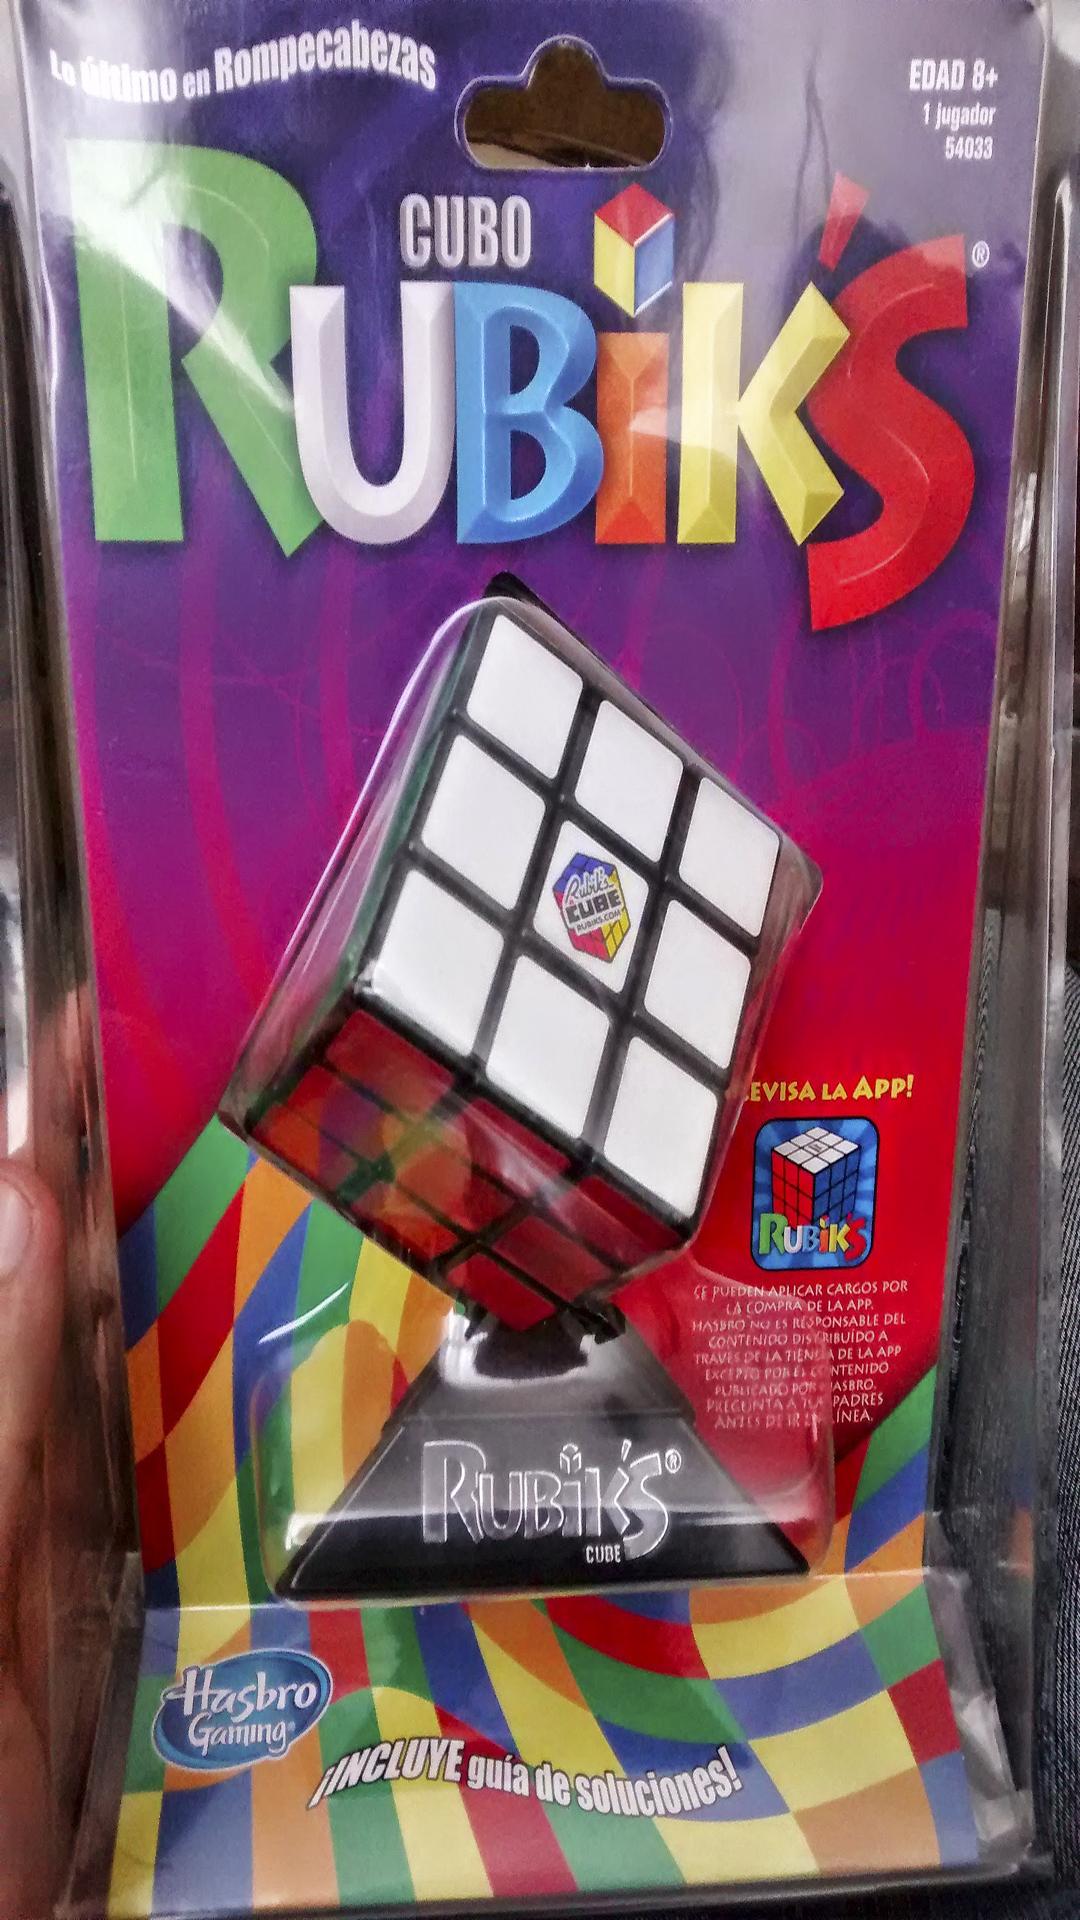 Bodega Comercial Mexicana: Cubo Rubik's a $48 pesos